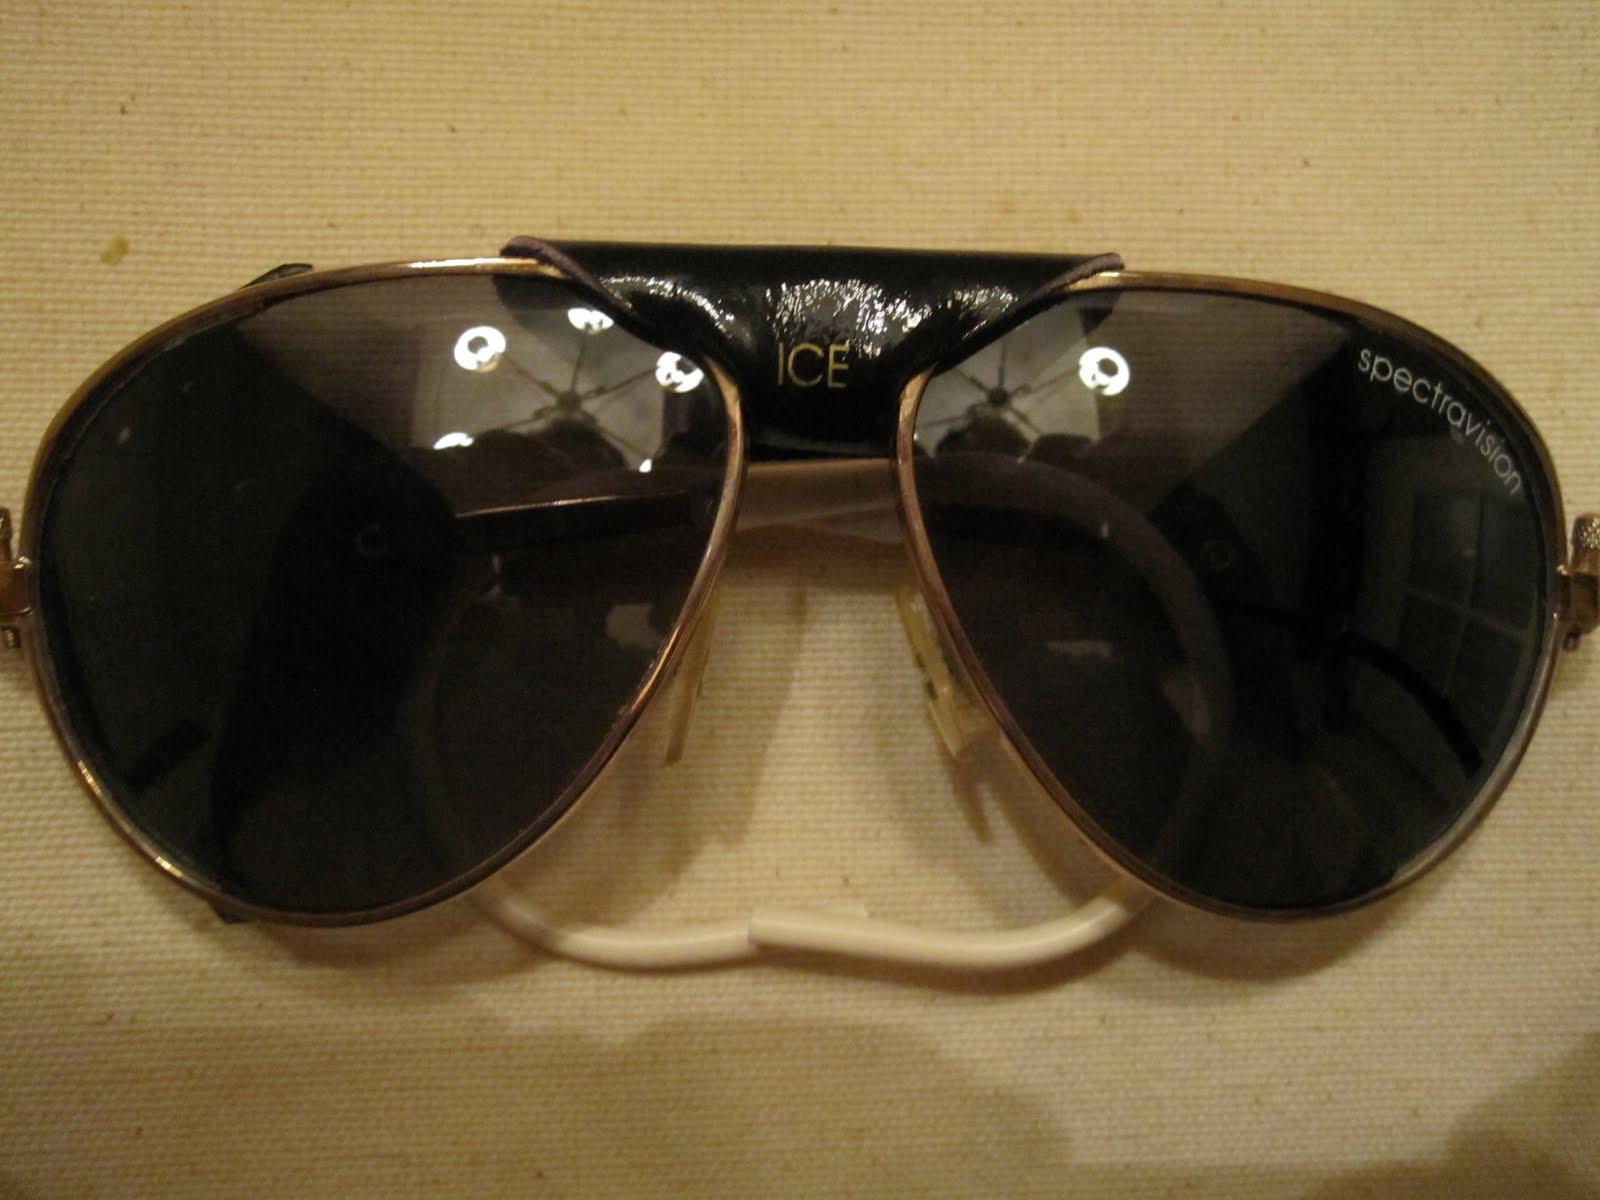 Vintage Alpina Sunglasses For Sale Louisiana Bucket Brigade - Alpina sunglasses for sale